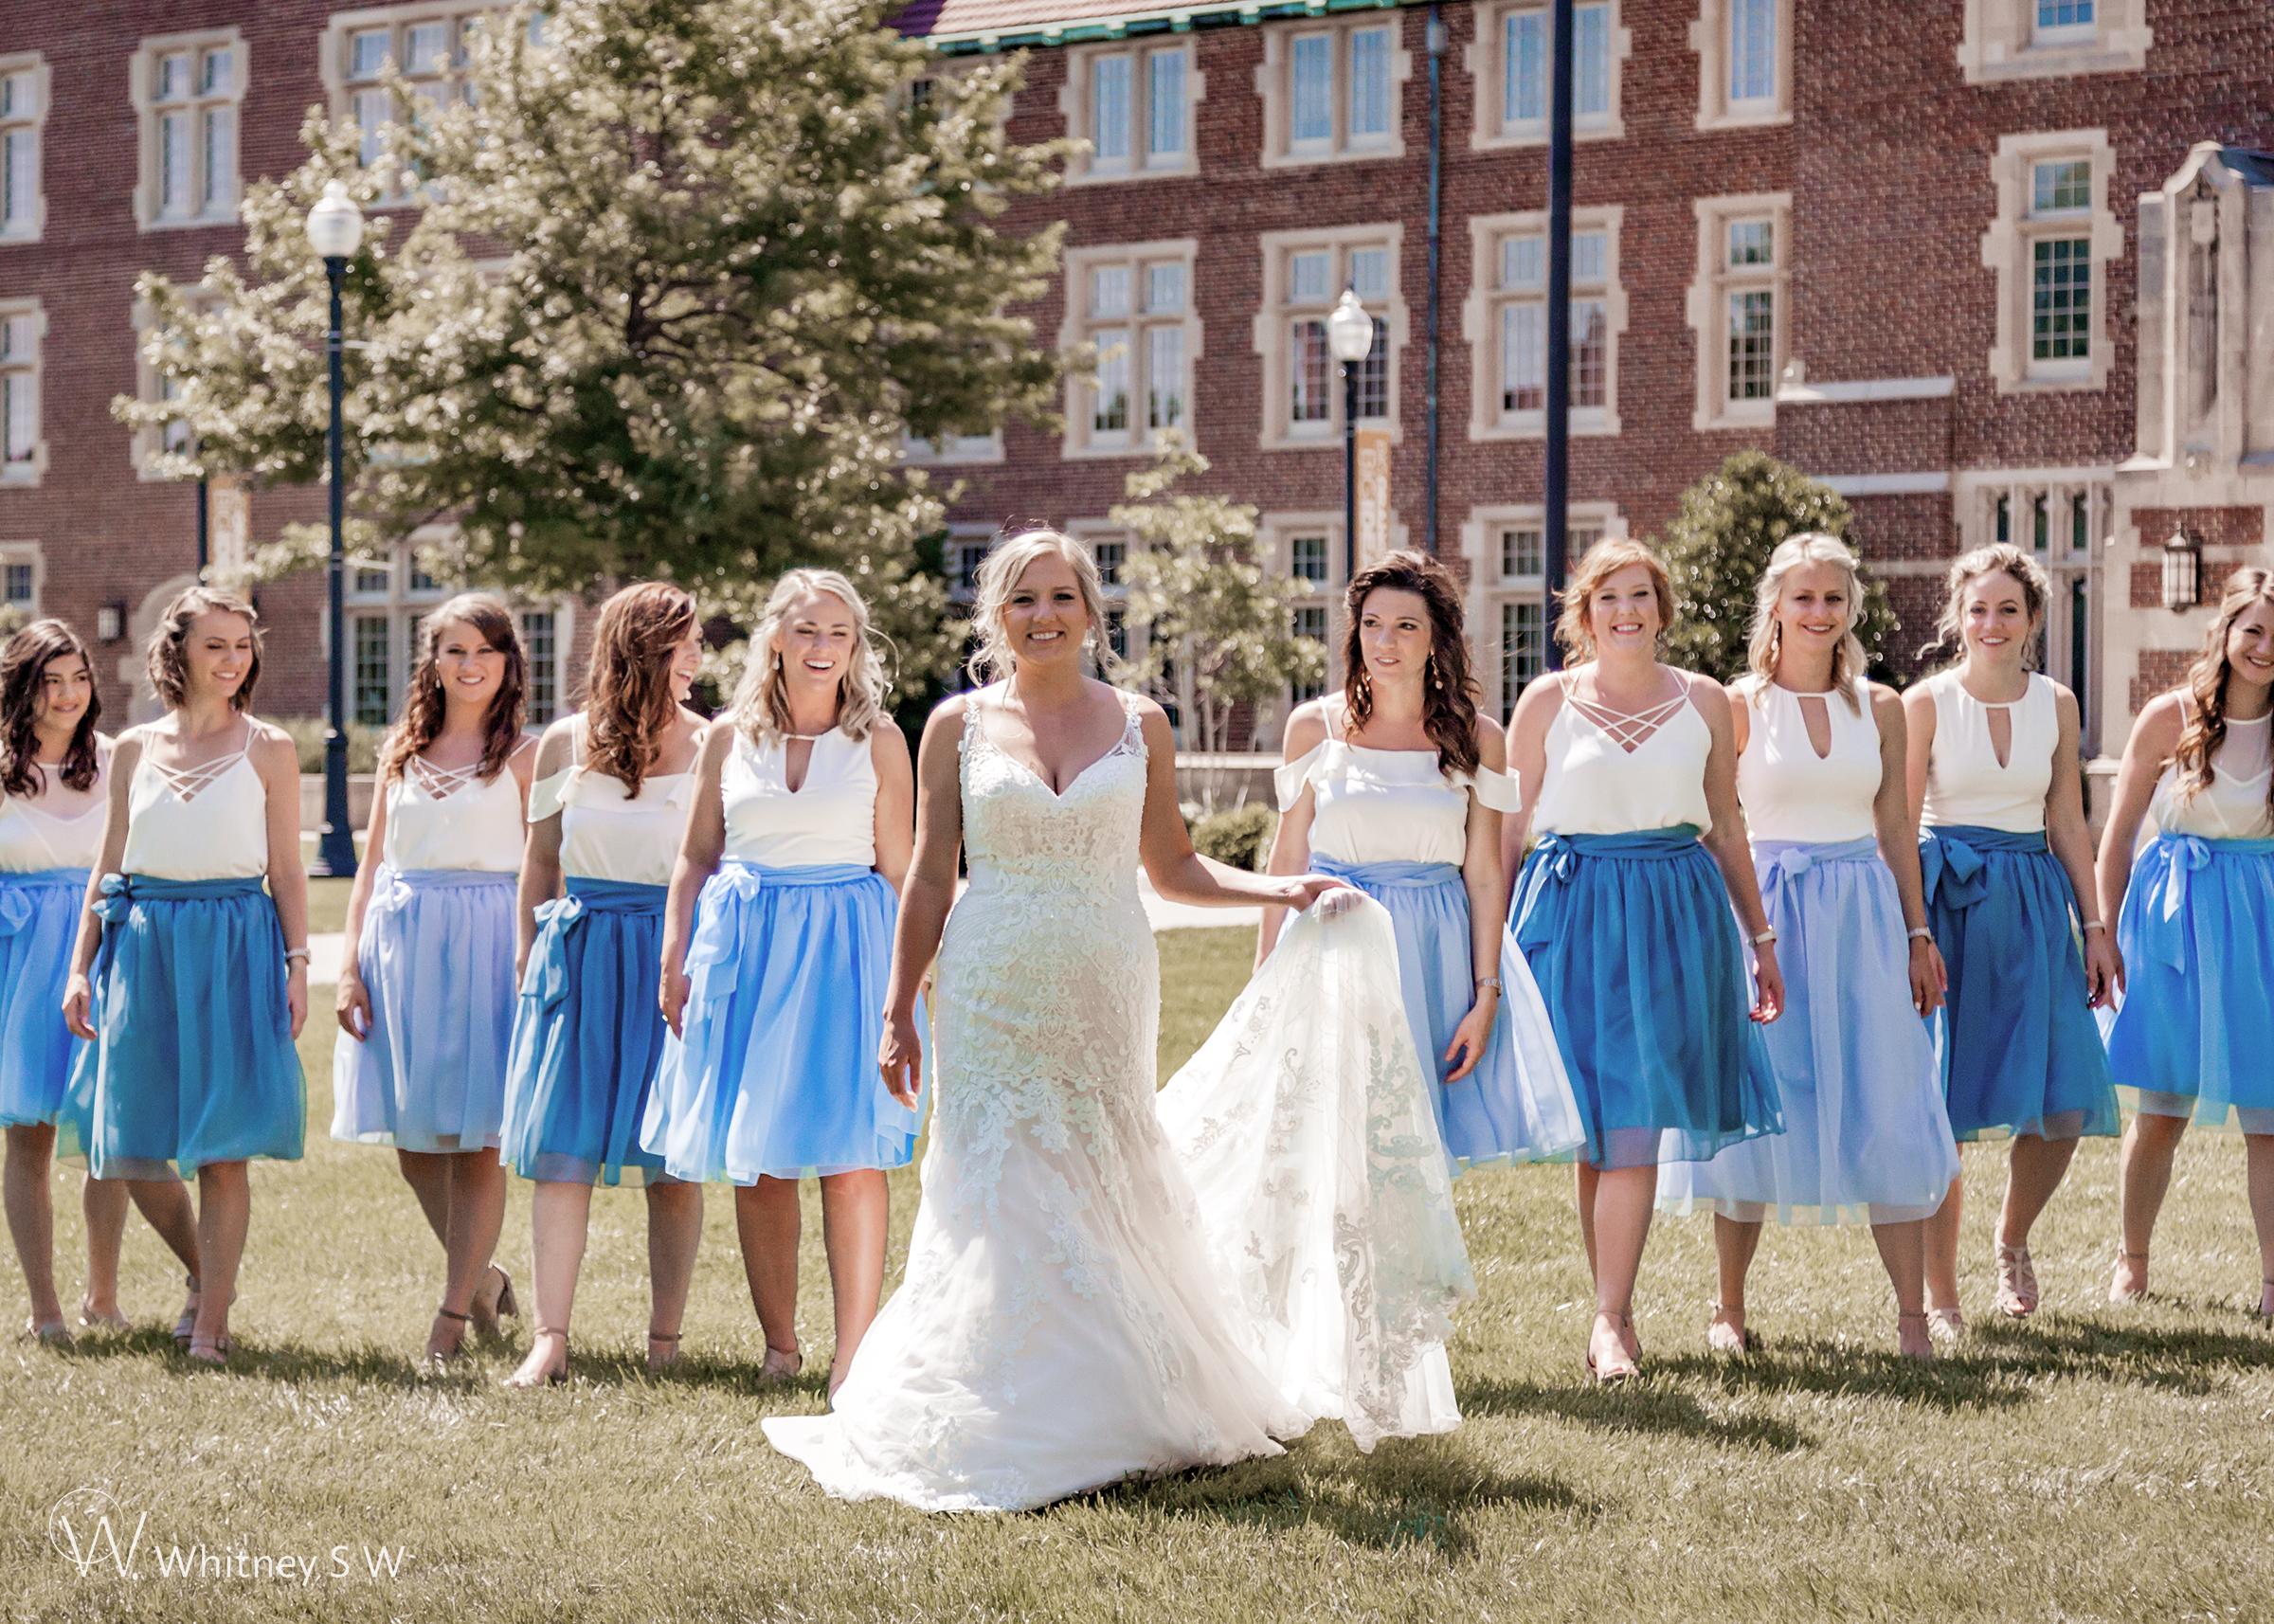 Morgan & Kaivon Wedding - Photography by Whitney S Williams whitneysw (35).jpg